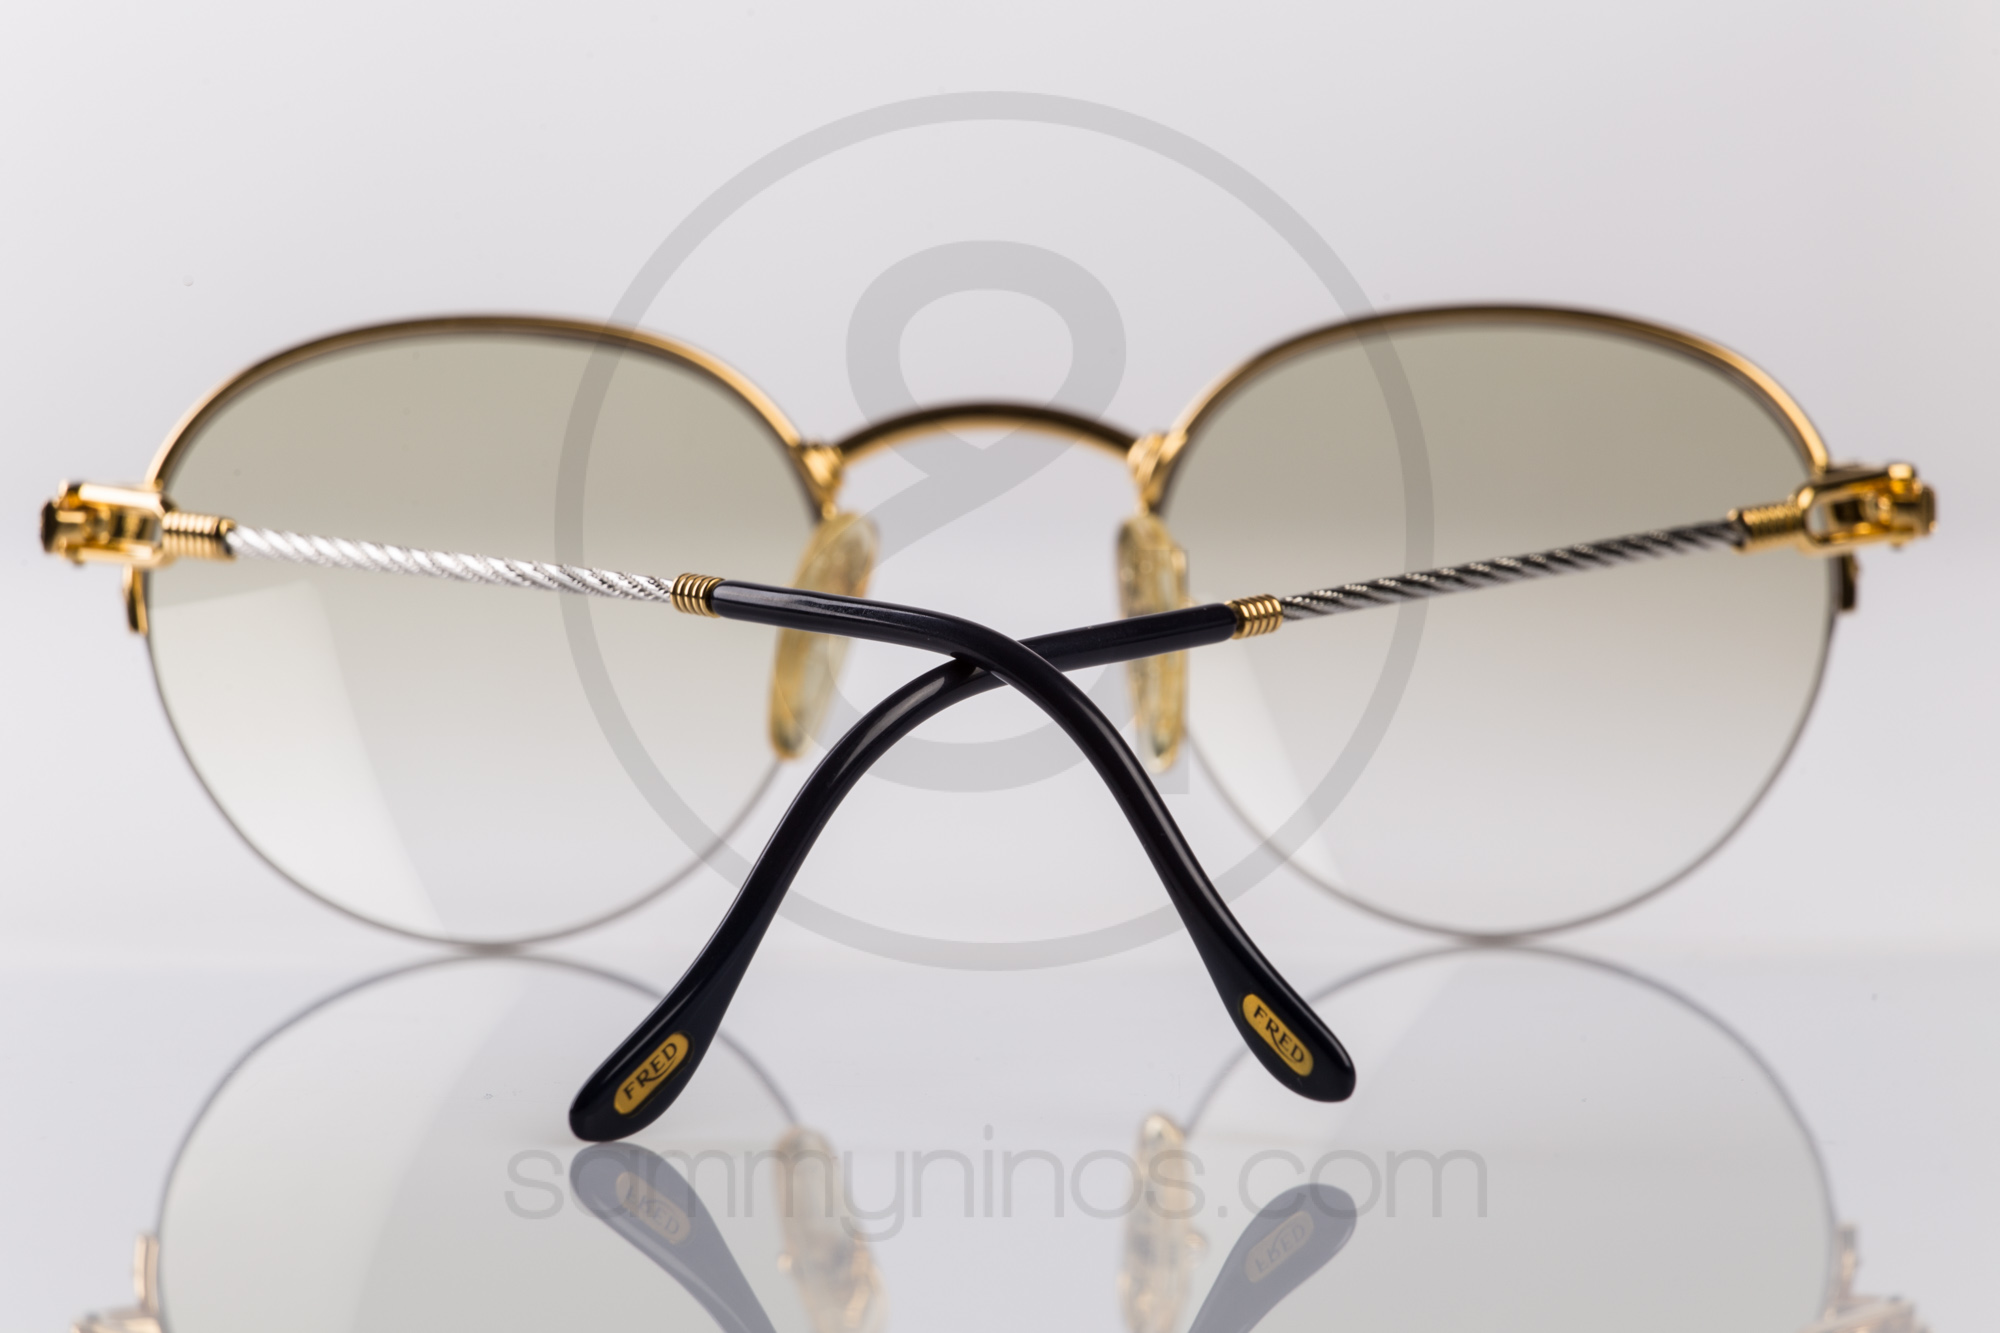 Vintage Fred Sunglasses Grand Largue Sammy Store